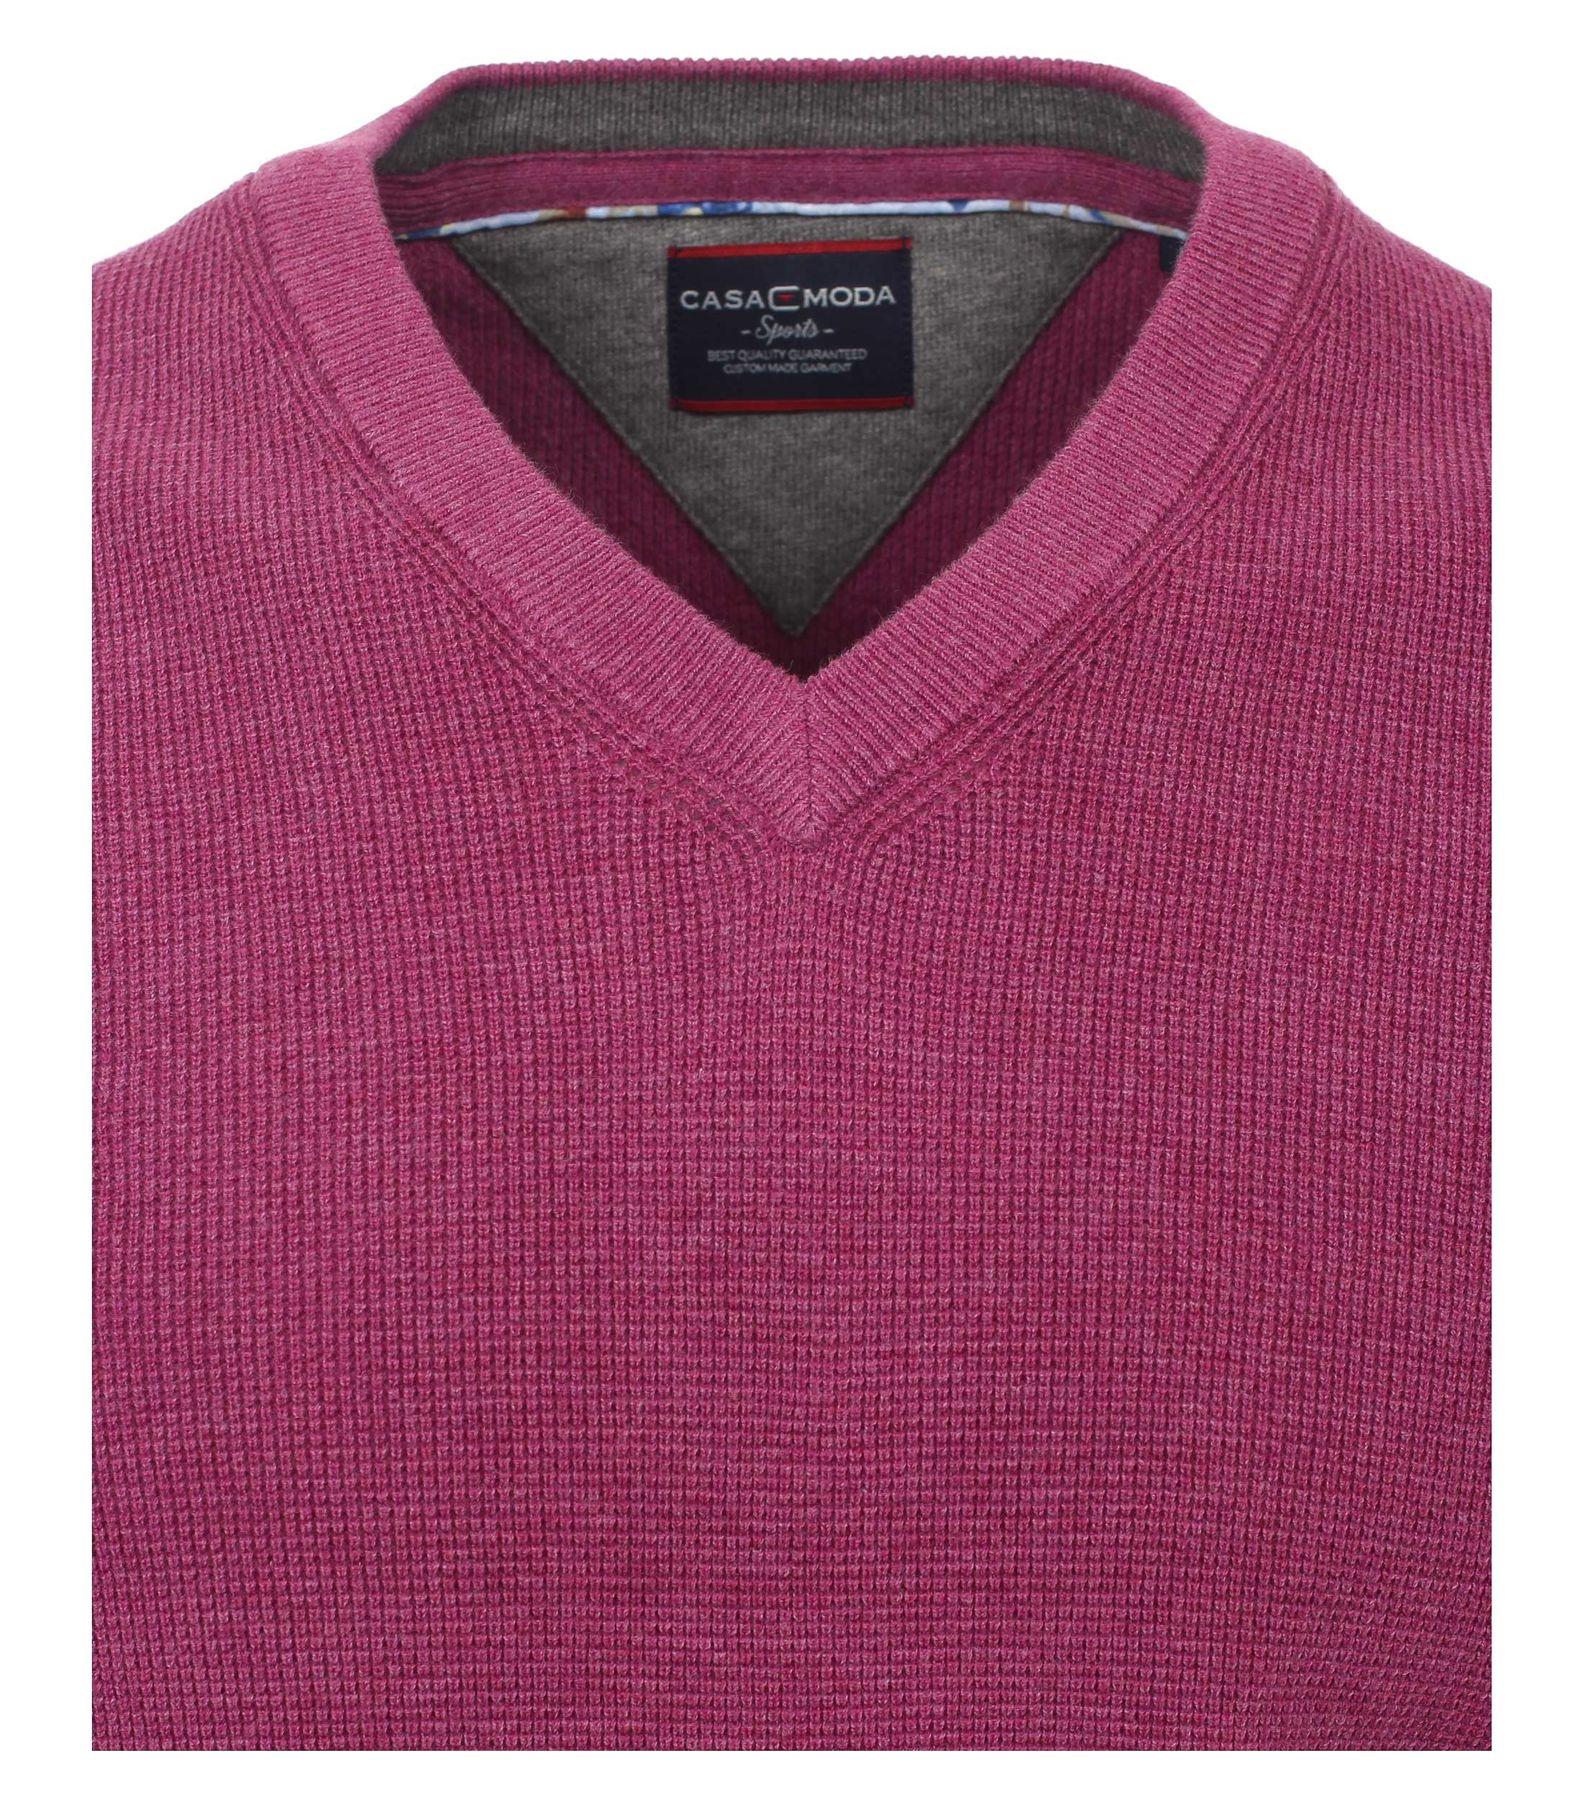 Casa Moda - Unifarbener Herren Pullover mit V-Ausschnitt  (472625000A) – Bild 18